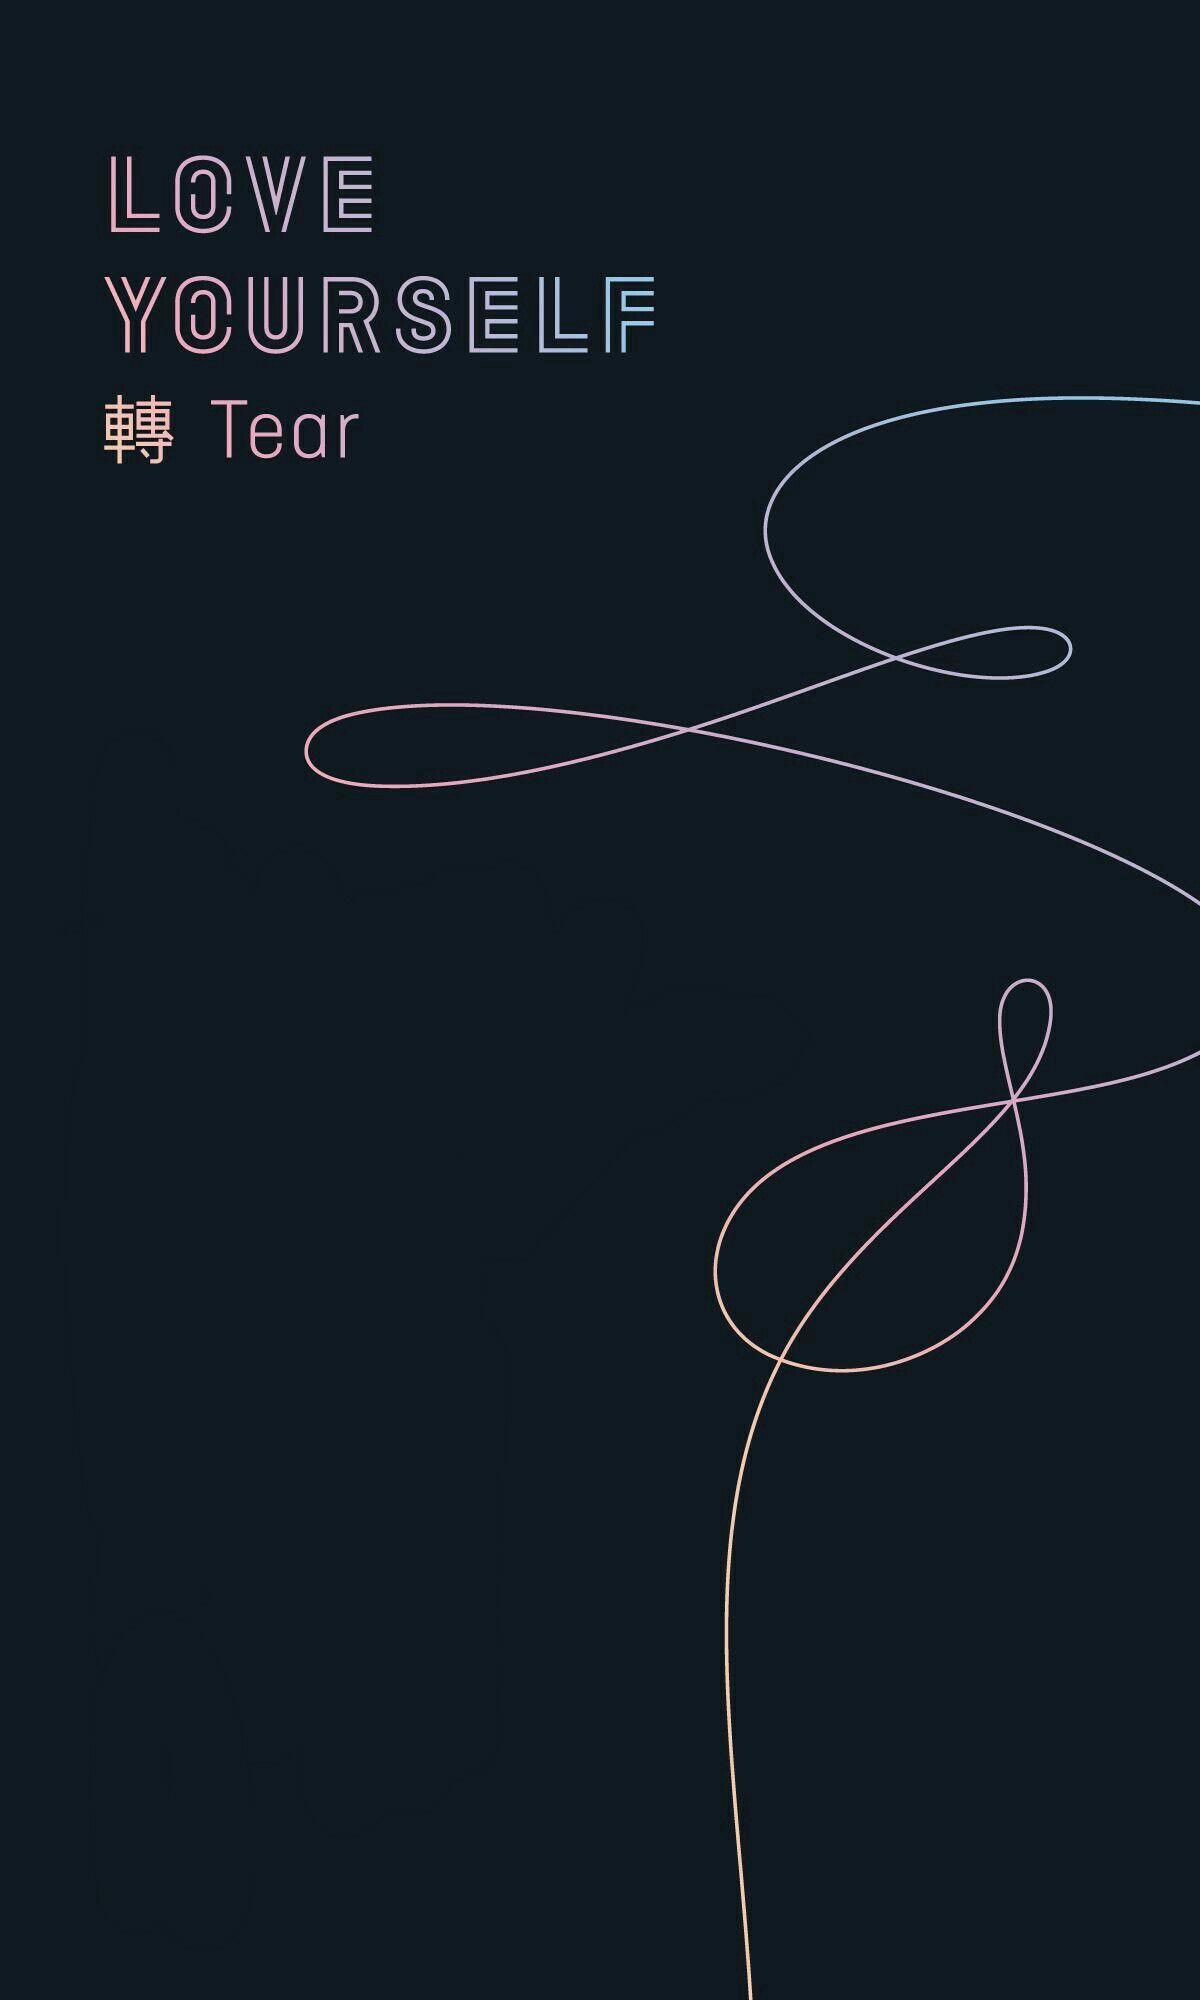 Love Yourself Tear Bts 壁紙 ジミン 画像 Bts 画像